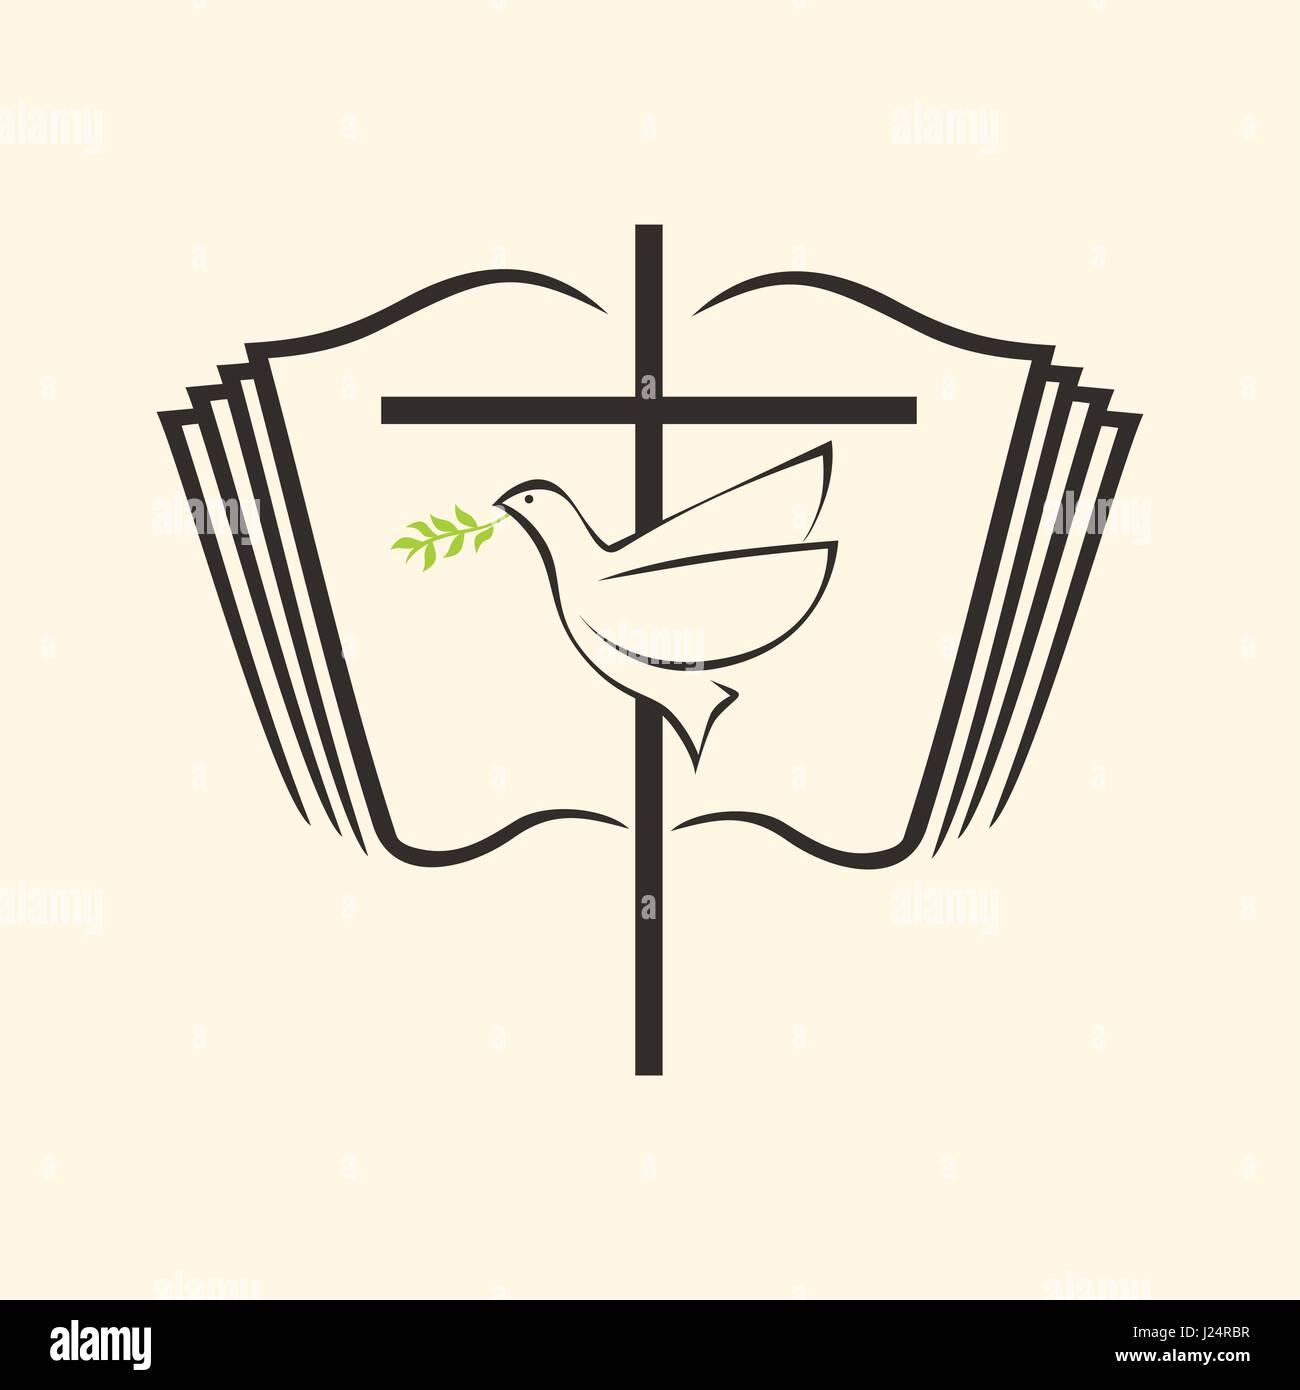 church logo christian symbols open stock photos u0026 church logo